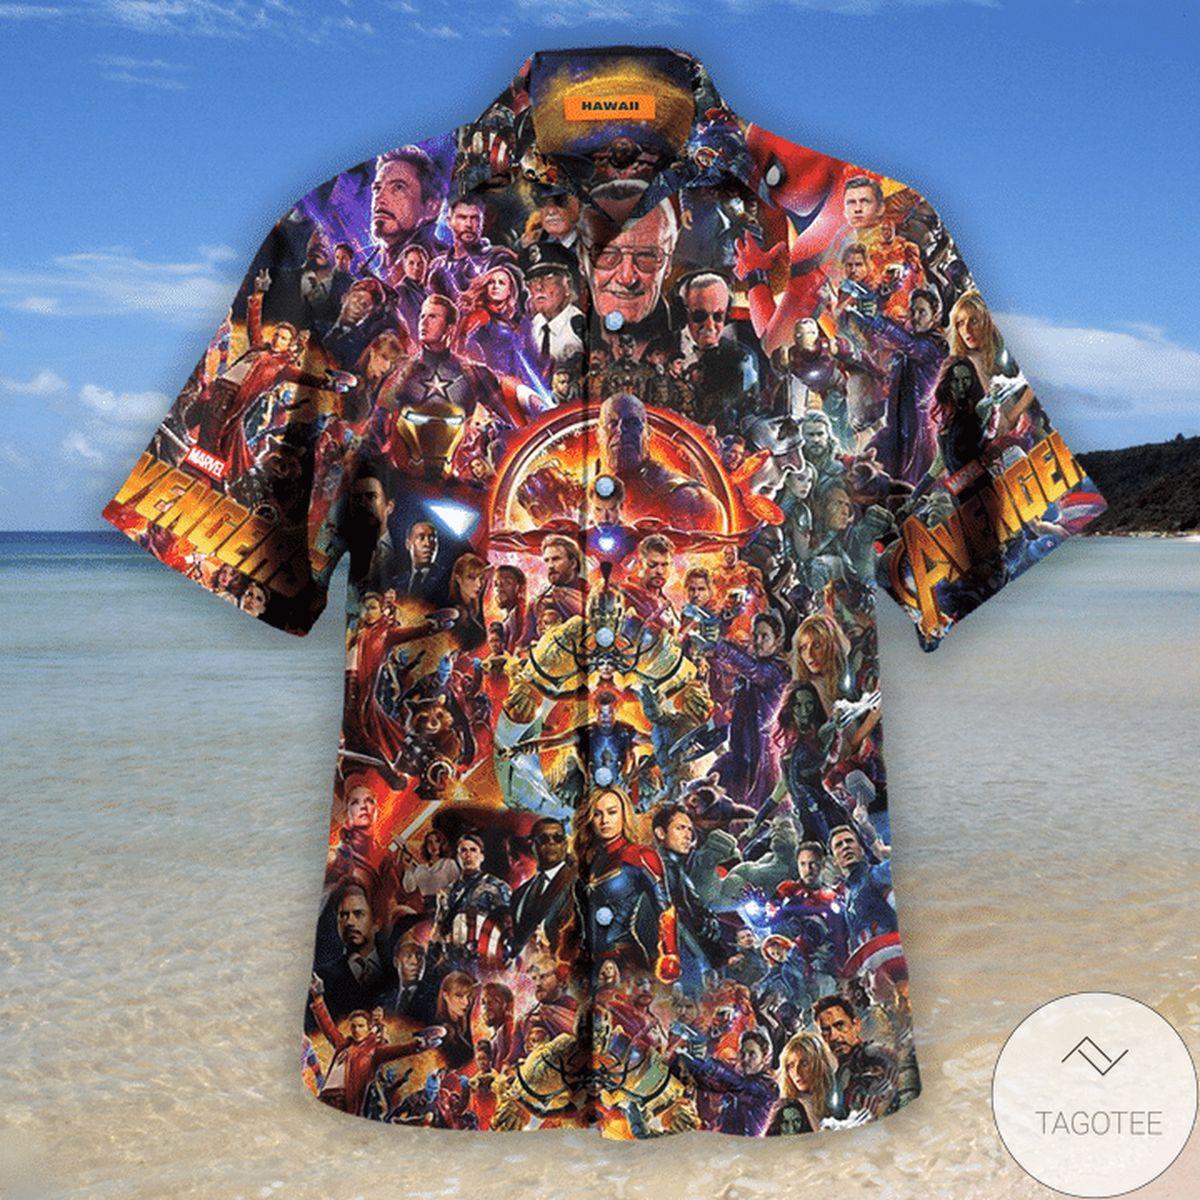 Luxury Avengers I Love You 3000 Unisex Hawaiian Shirt